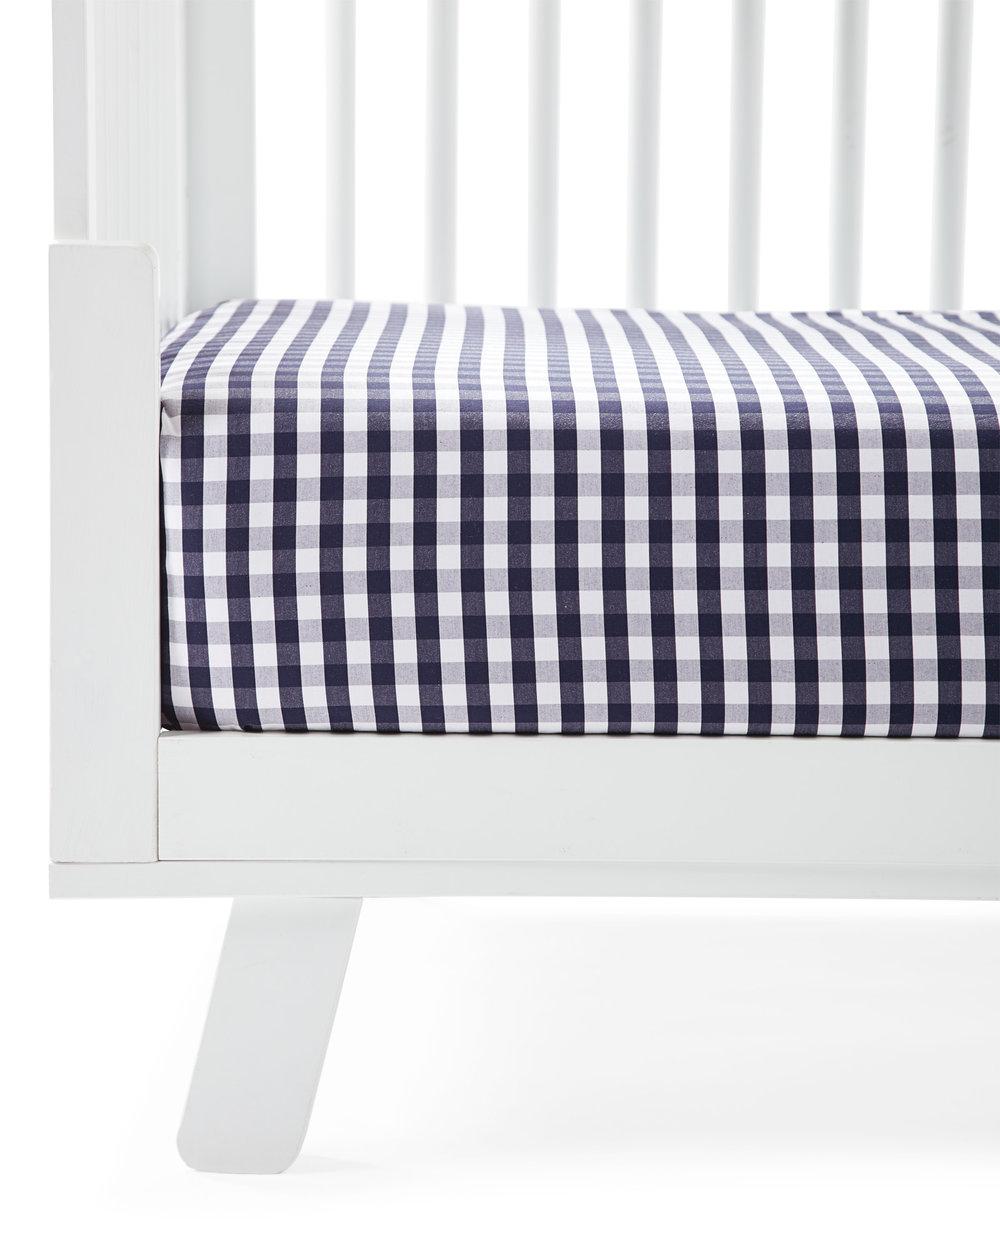 Serena and Lily Gingham Crib Sheet